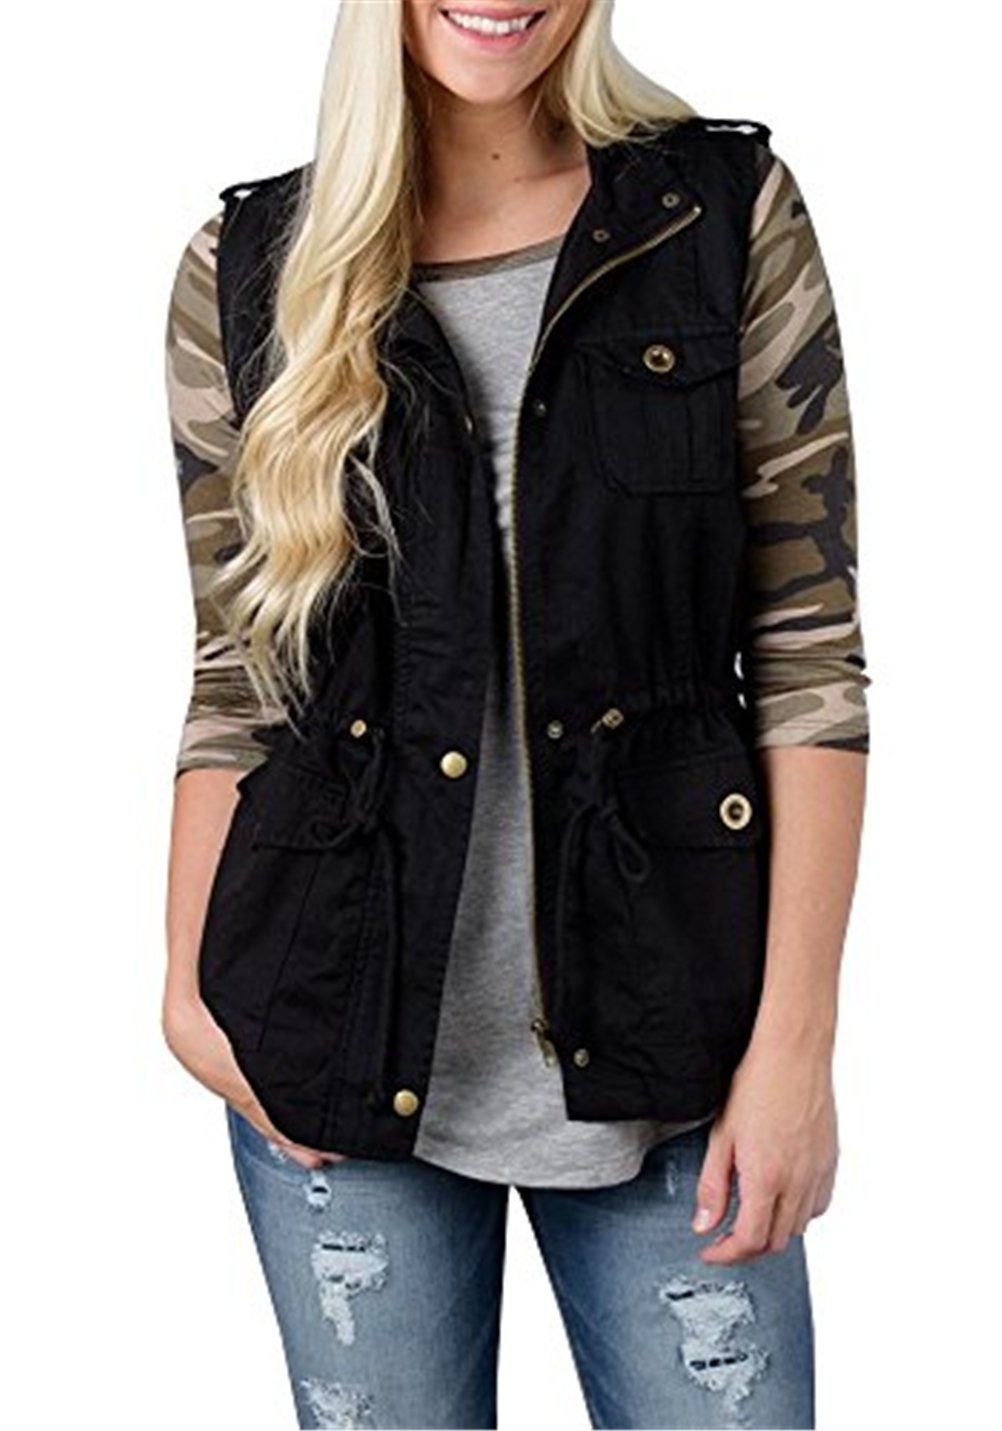 U-WARDROB Sleeveless Military Lightweight Warm Vest Jacket With Pocket for Women Black S